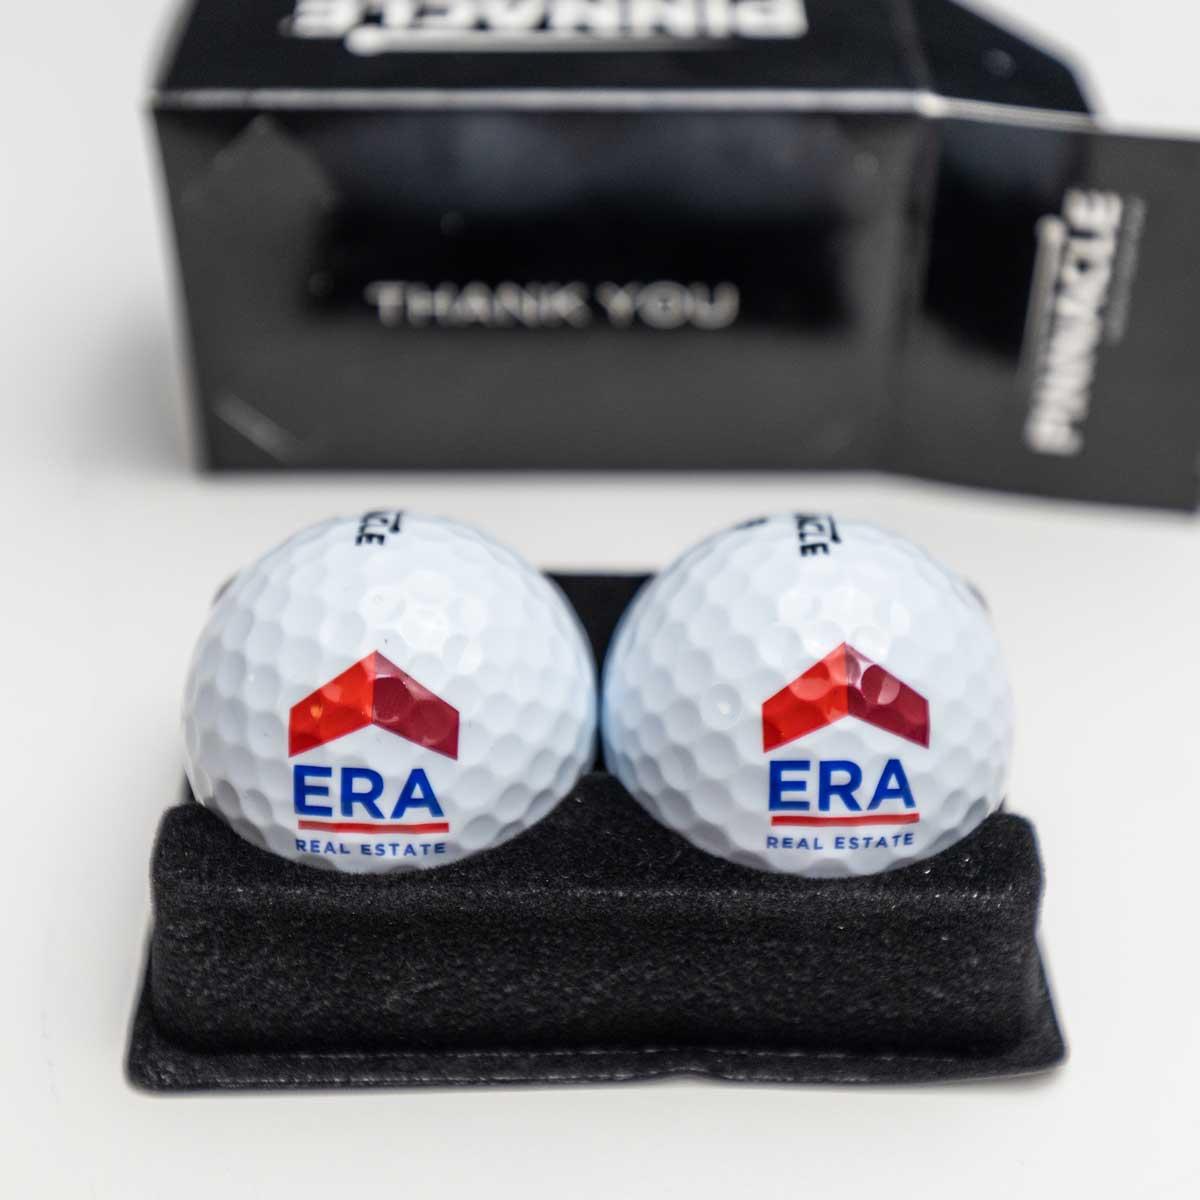 ERA Branded Pinnacle Golf Balls